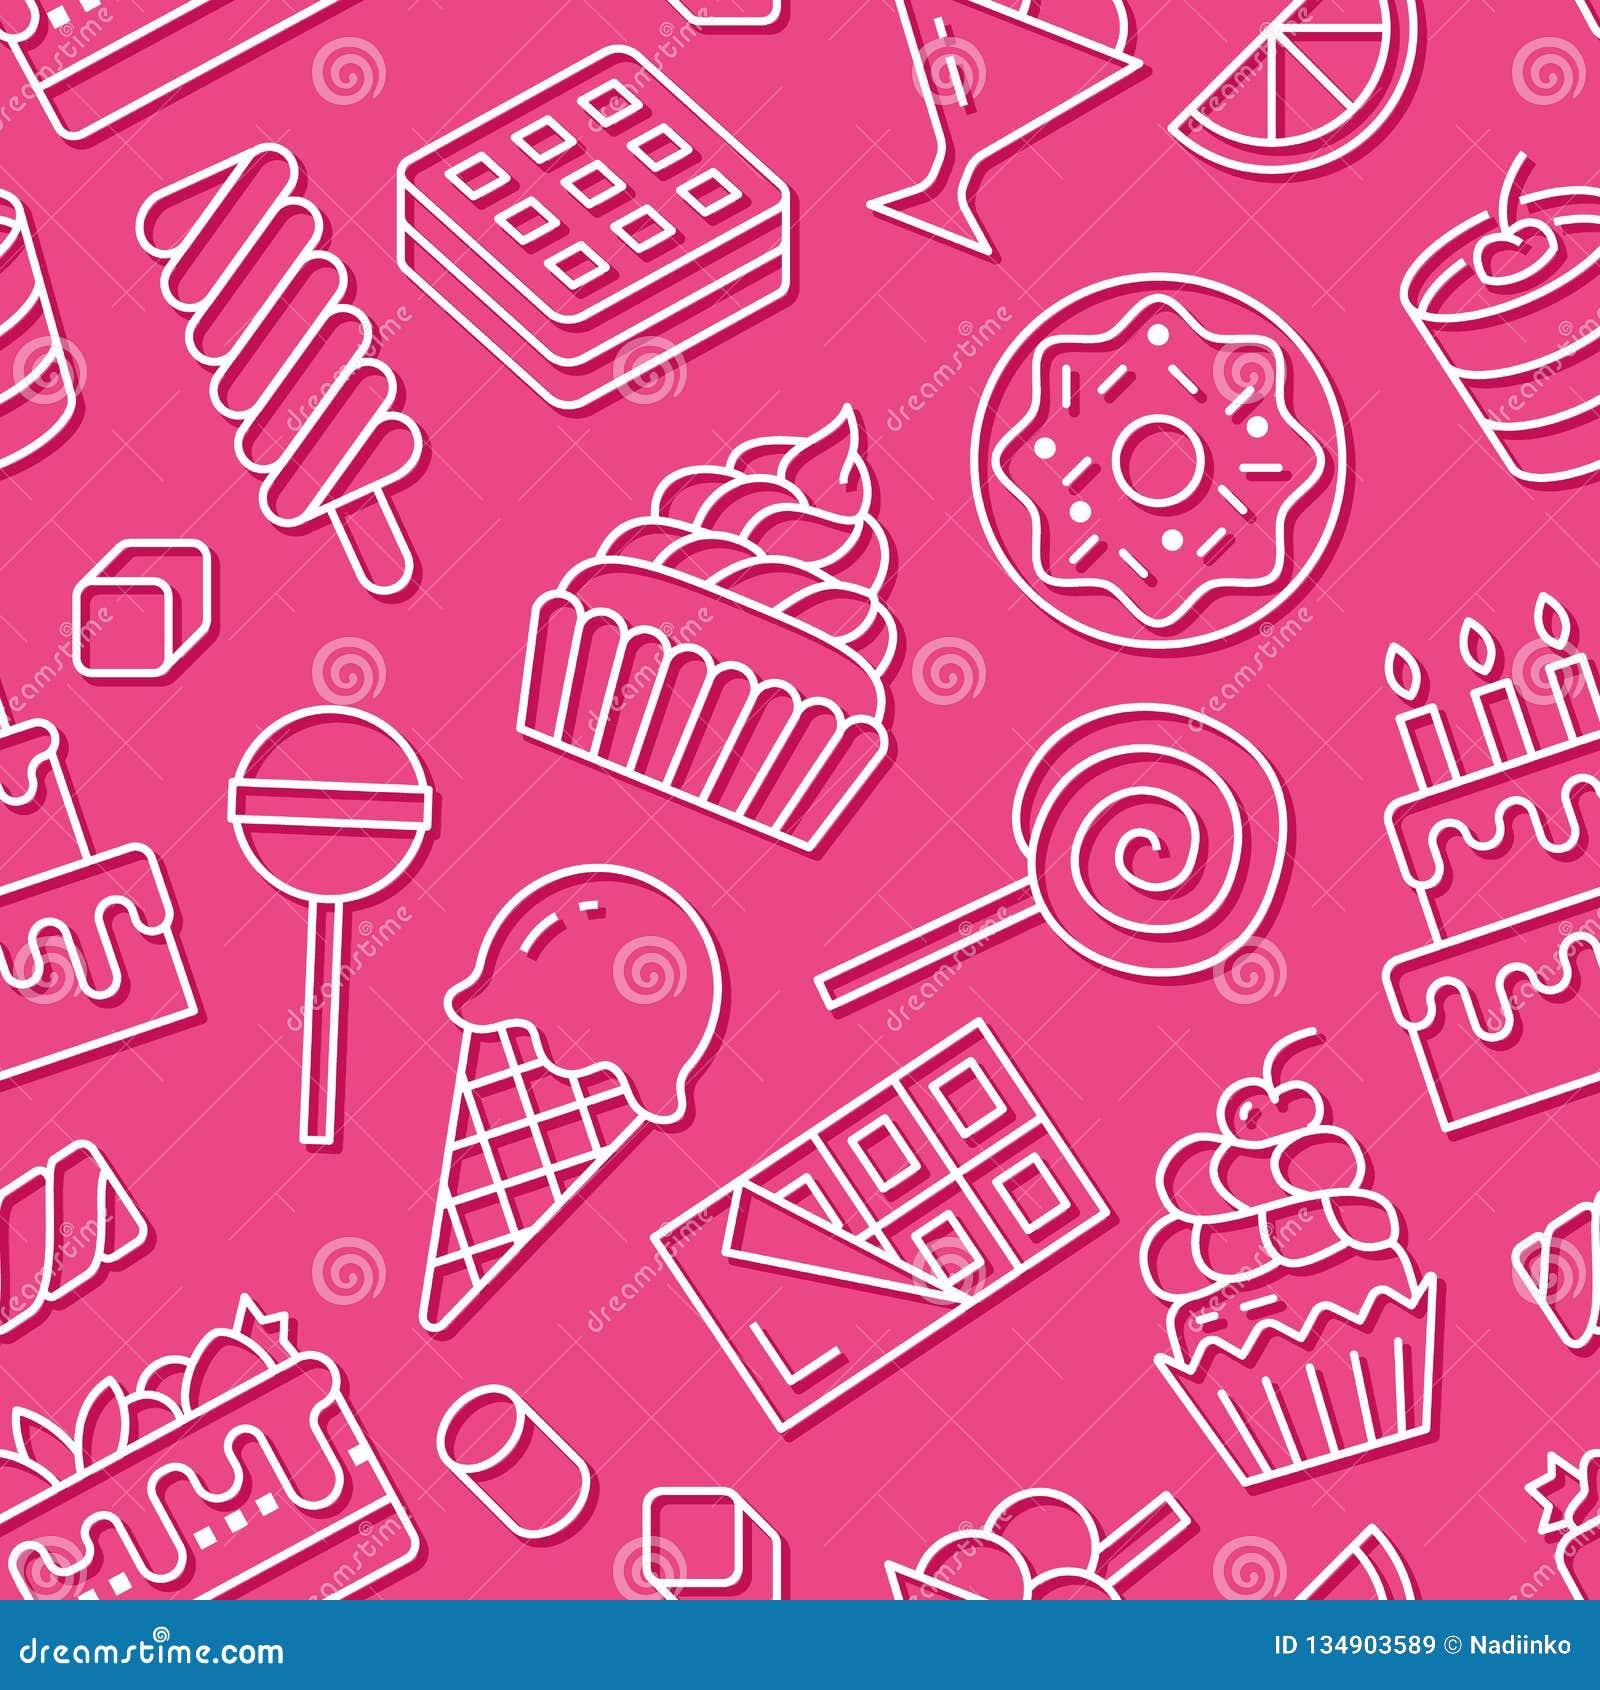 Sweet food seamless pattern with flat line icons. Pastry vector illustrations - lollipop, chocolate bar, milkshake